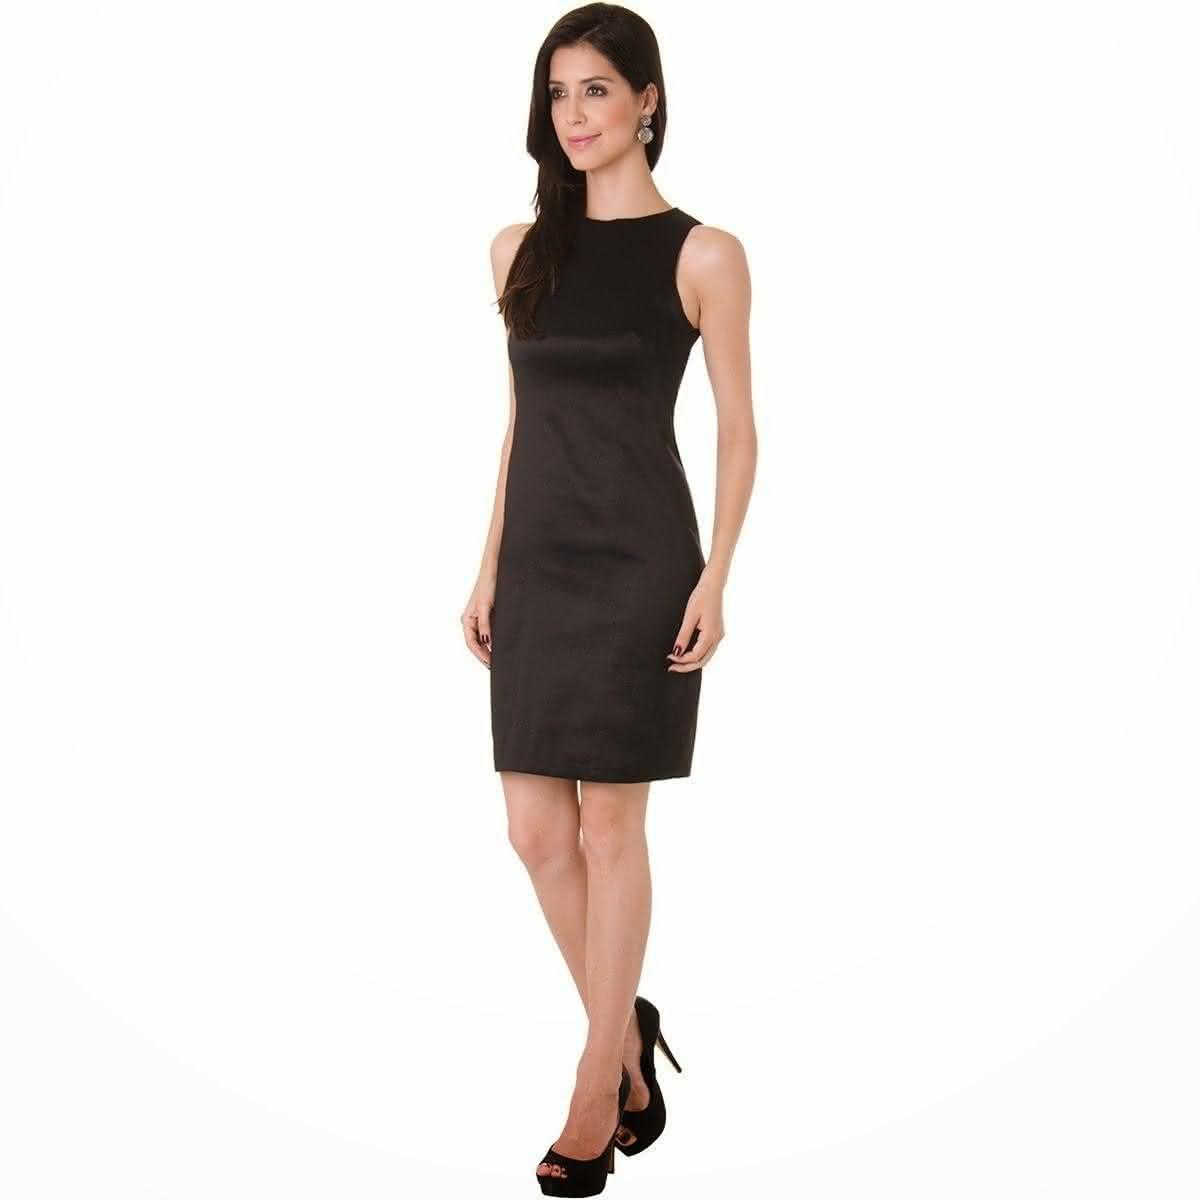 vestido-tubinho-classico-p-m-g-gg-9631-MLB20019101064_122013-F